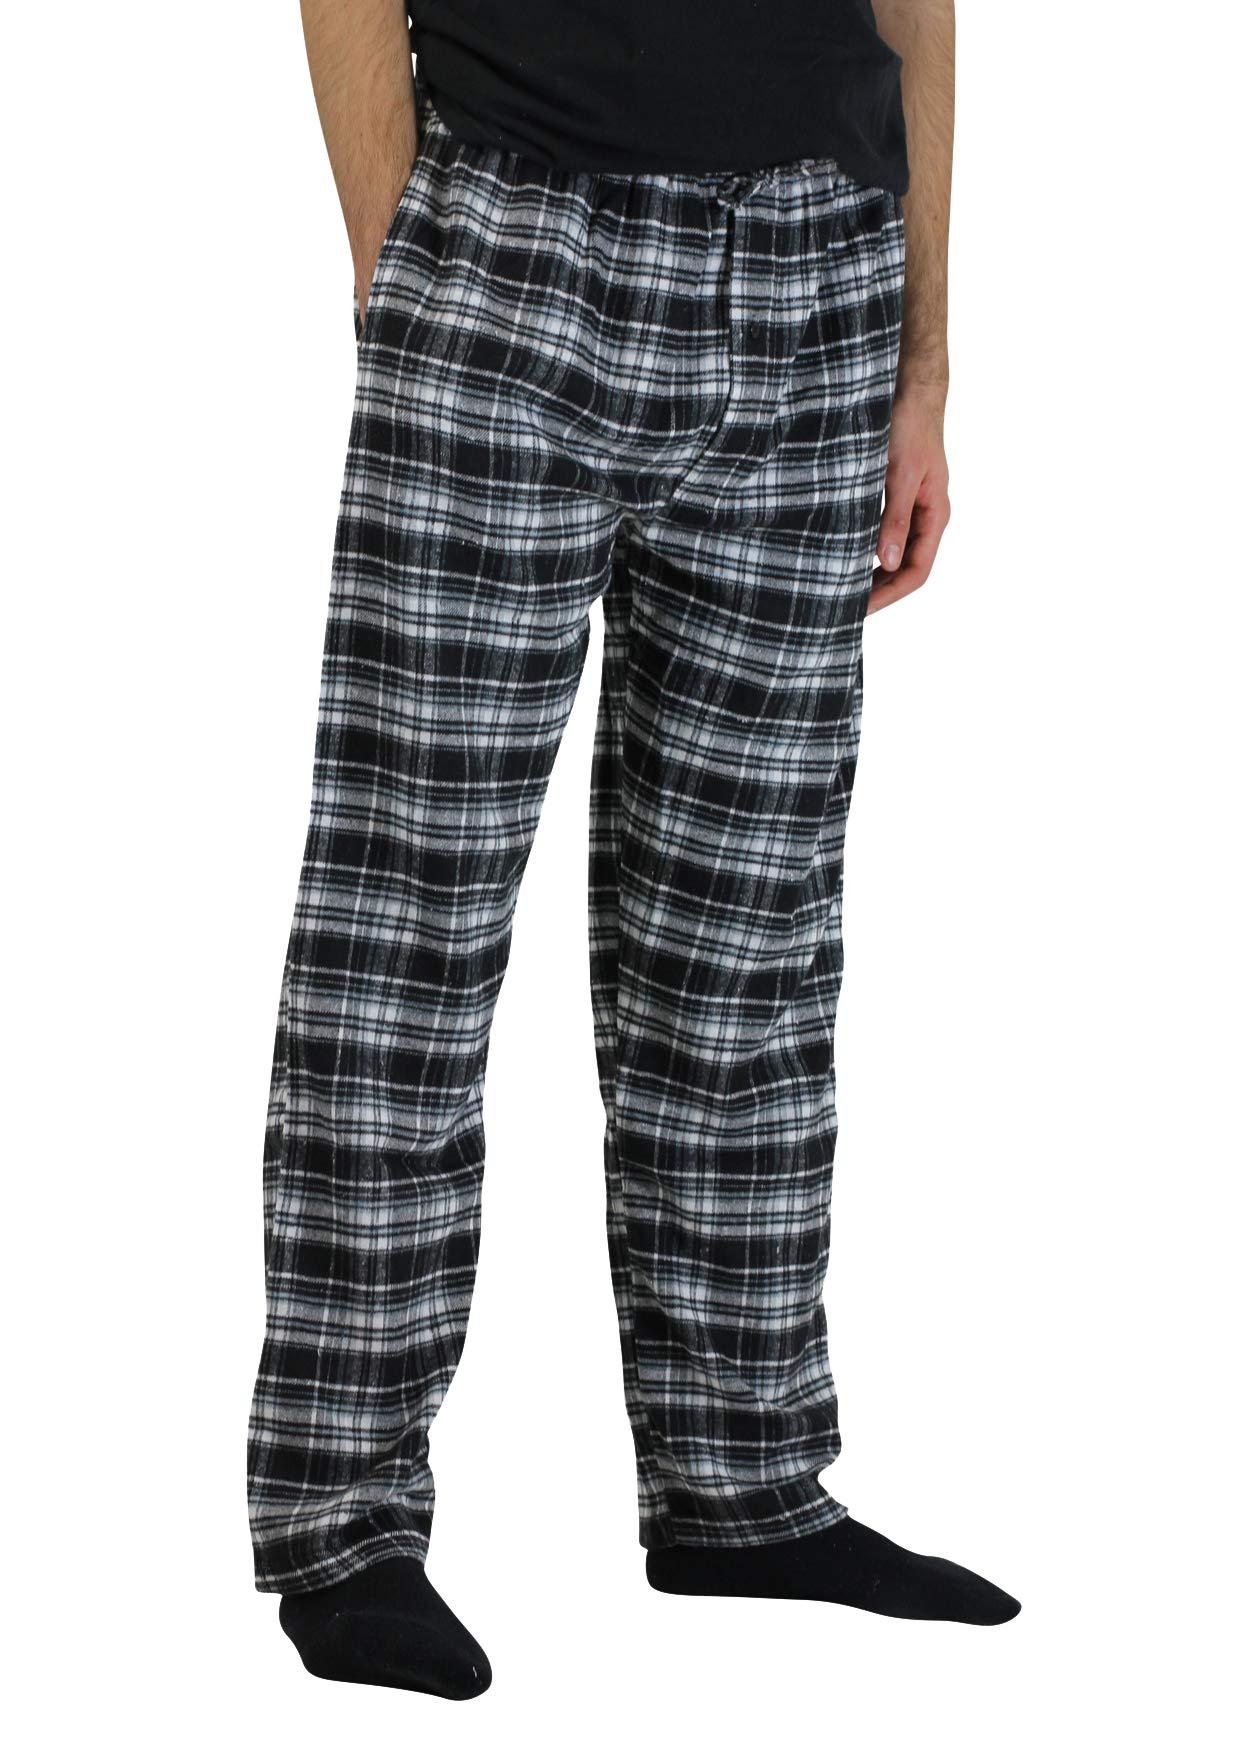 Real Essentials 3 Pack:Men's Cotton Super Soft Flannel Plaid Pajama Pants/Lounge Bottoms,Set 4-L by Real Essentials (Image #3)